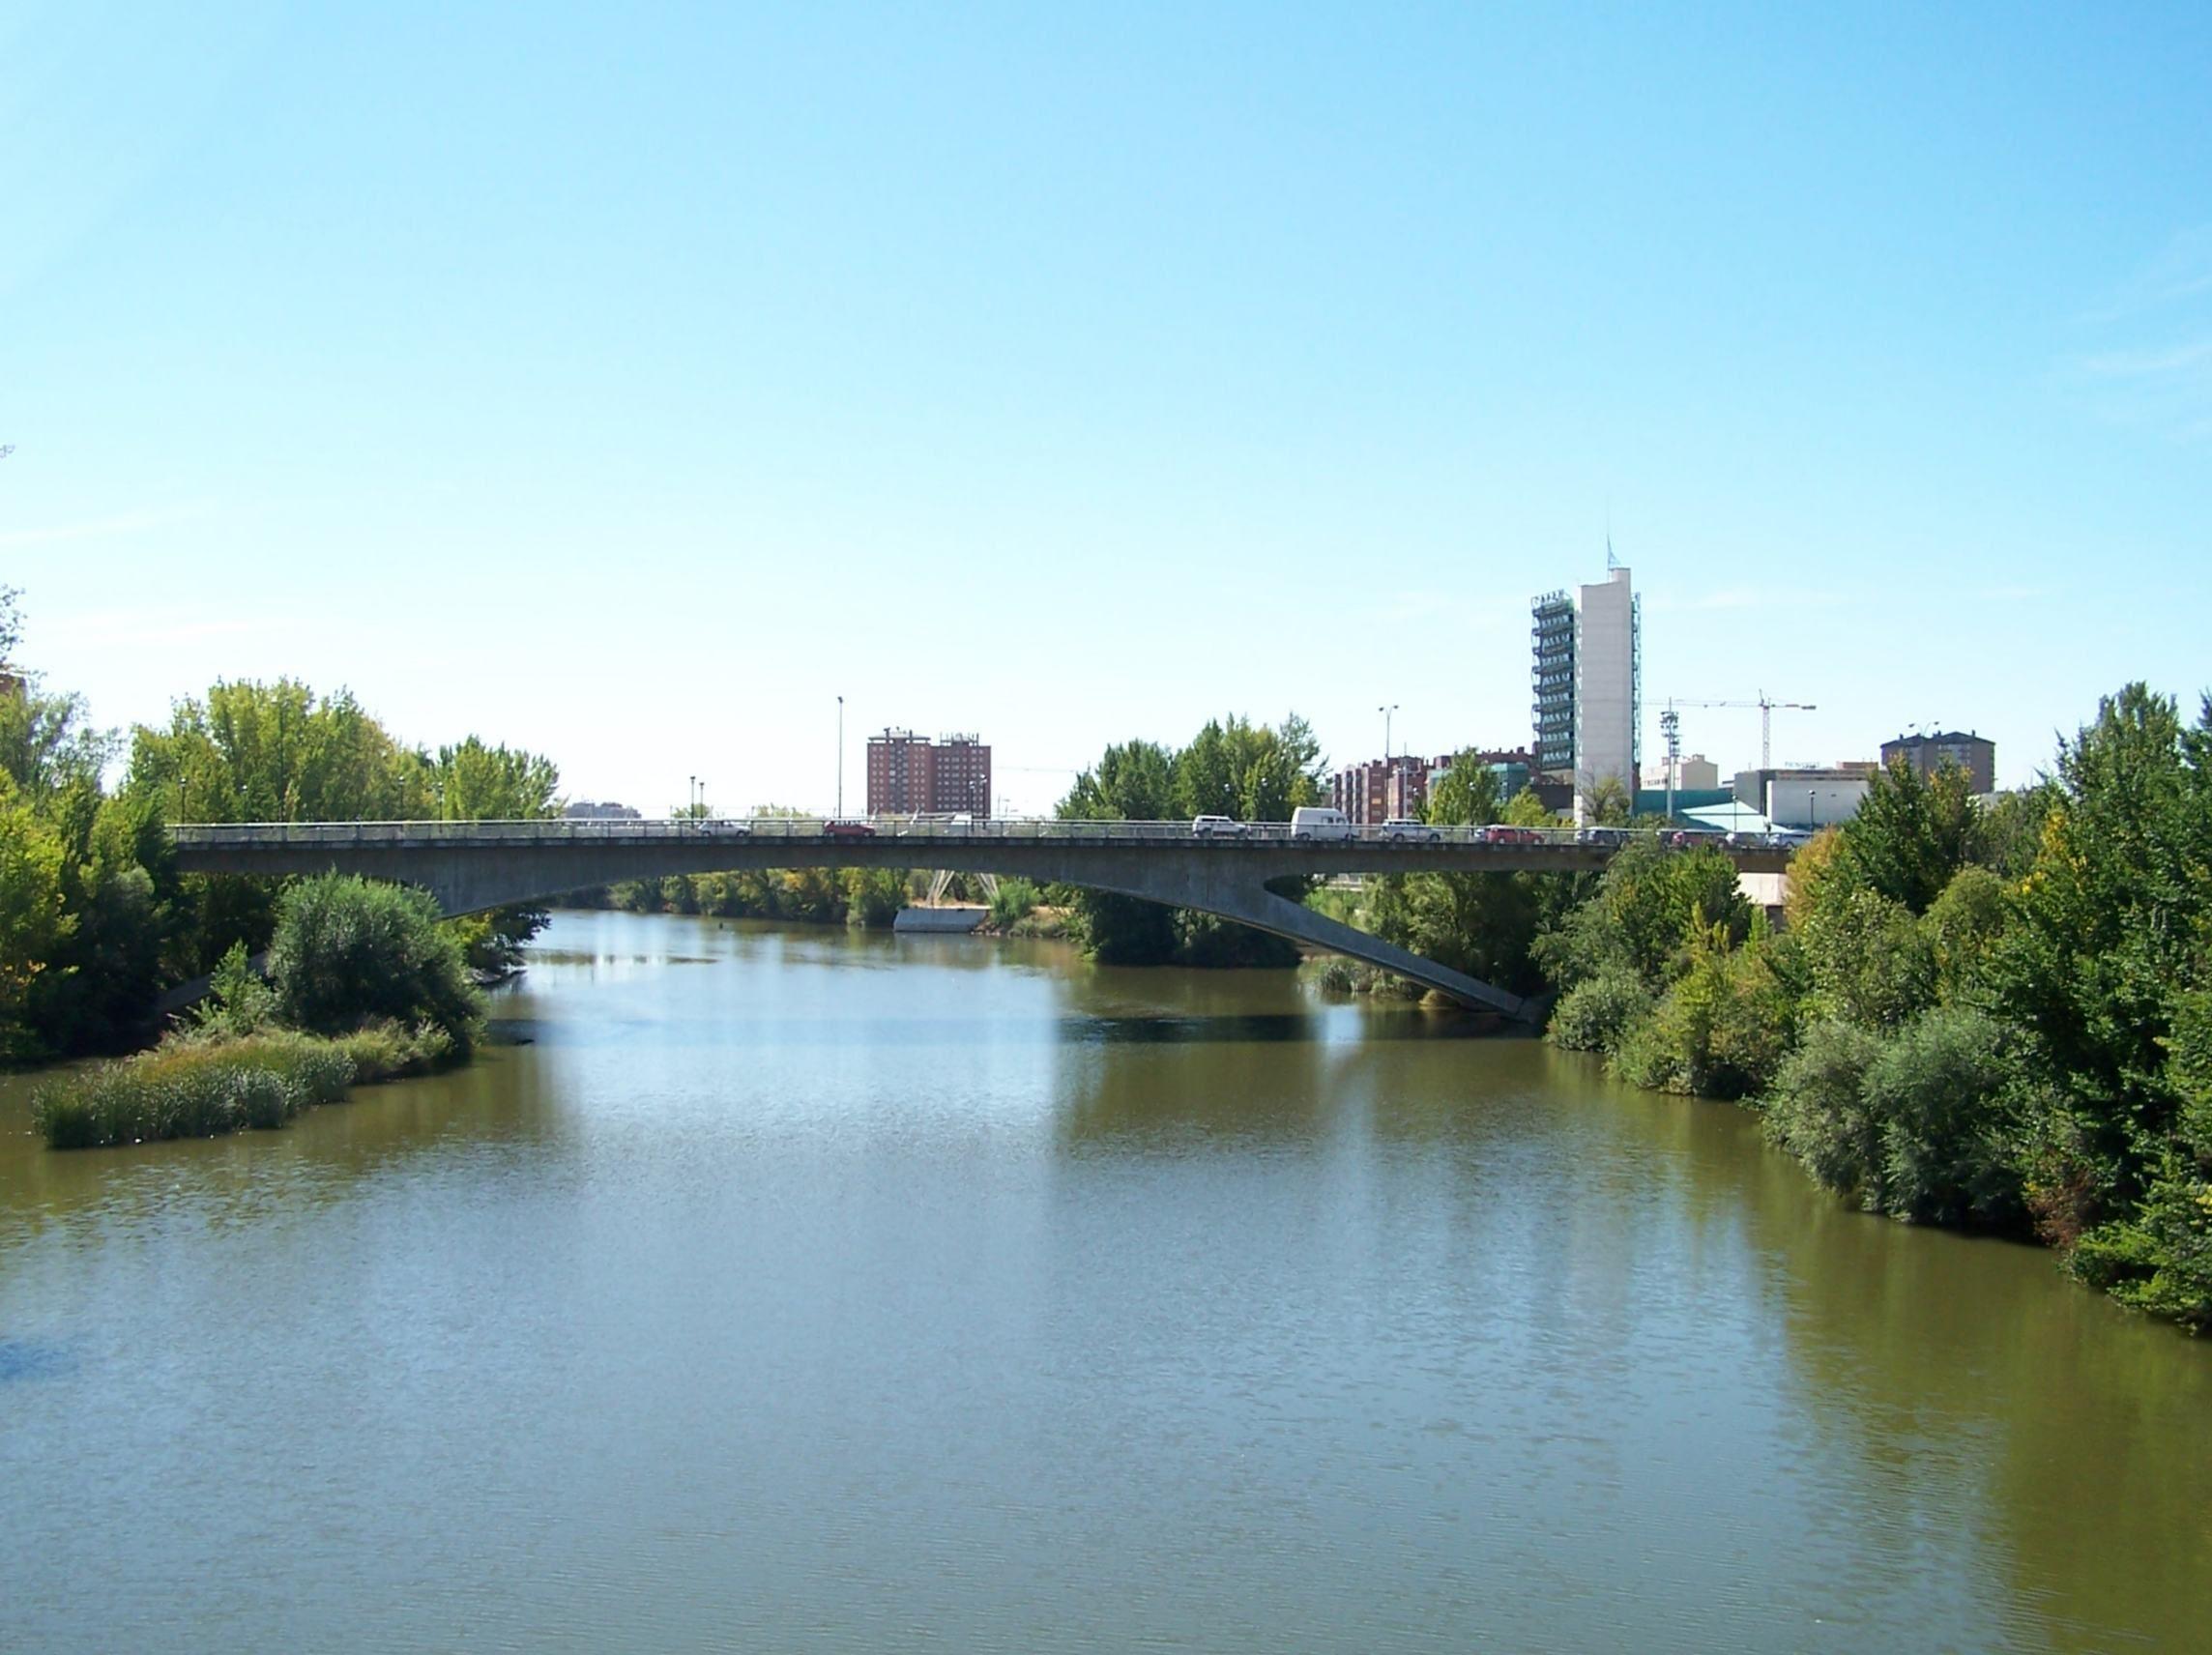 ¿Sabes distinguir este río a partir de la imagen?